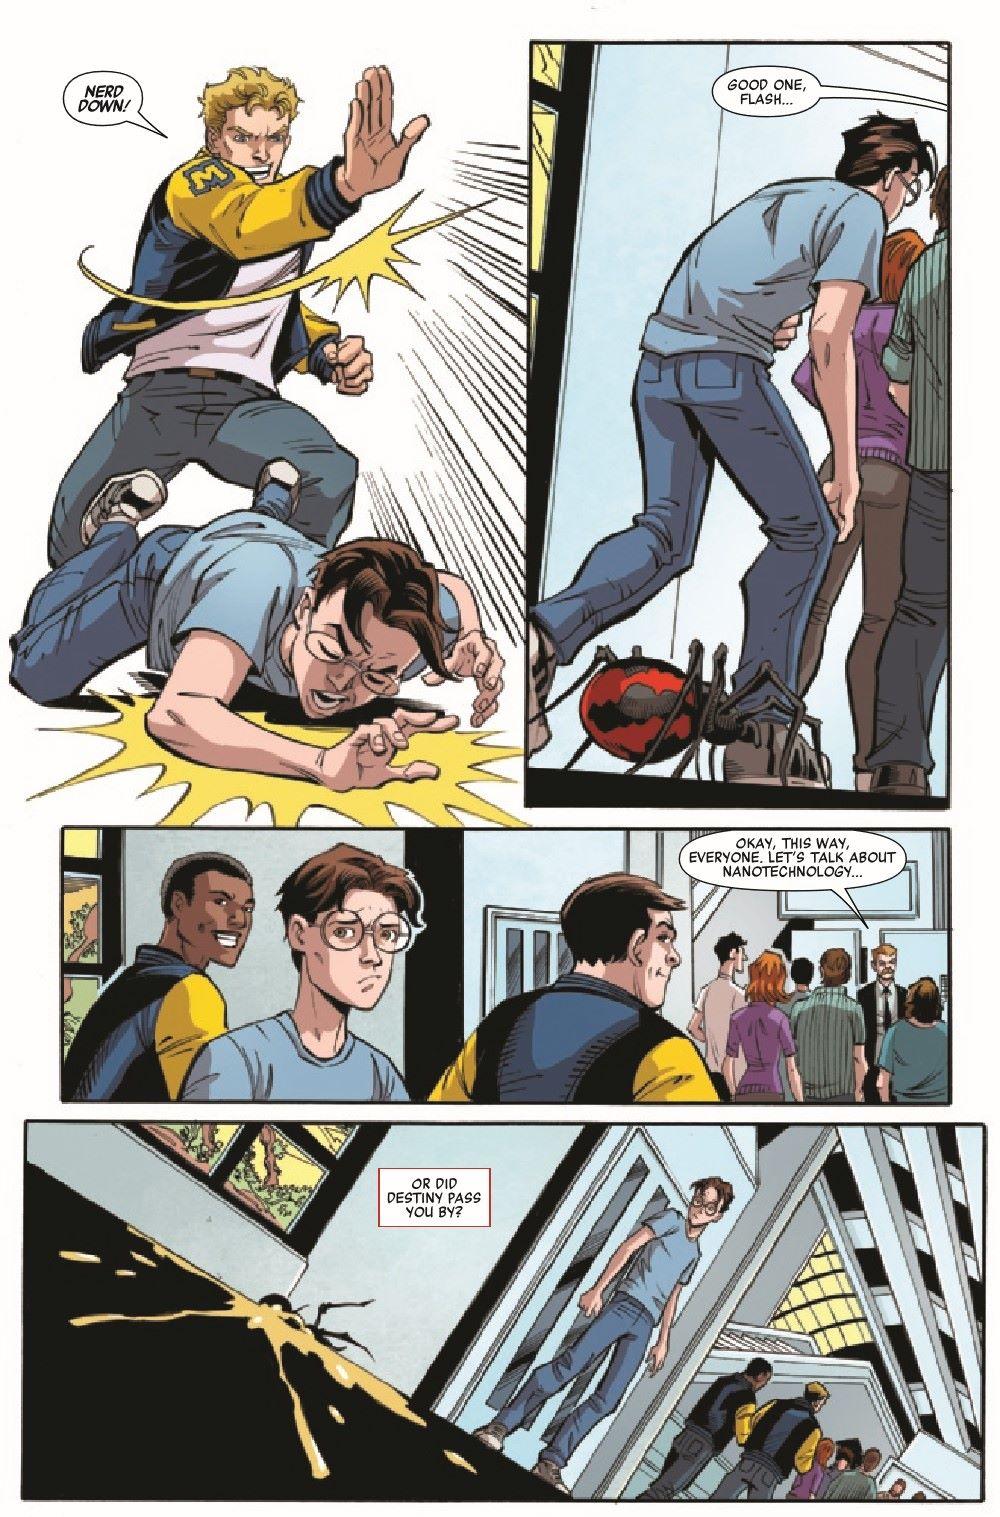 HRPPAMSHUT2021001_Preview-5 ComicList Previews: HEROES REBORN PETER PARKER THE AMAZING SHUTTERBUG #1